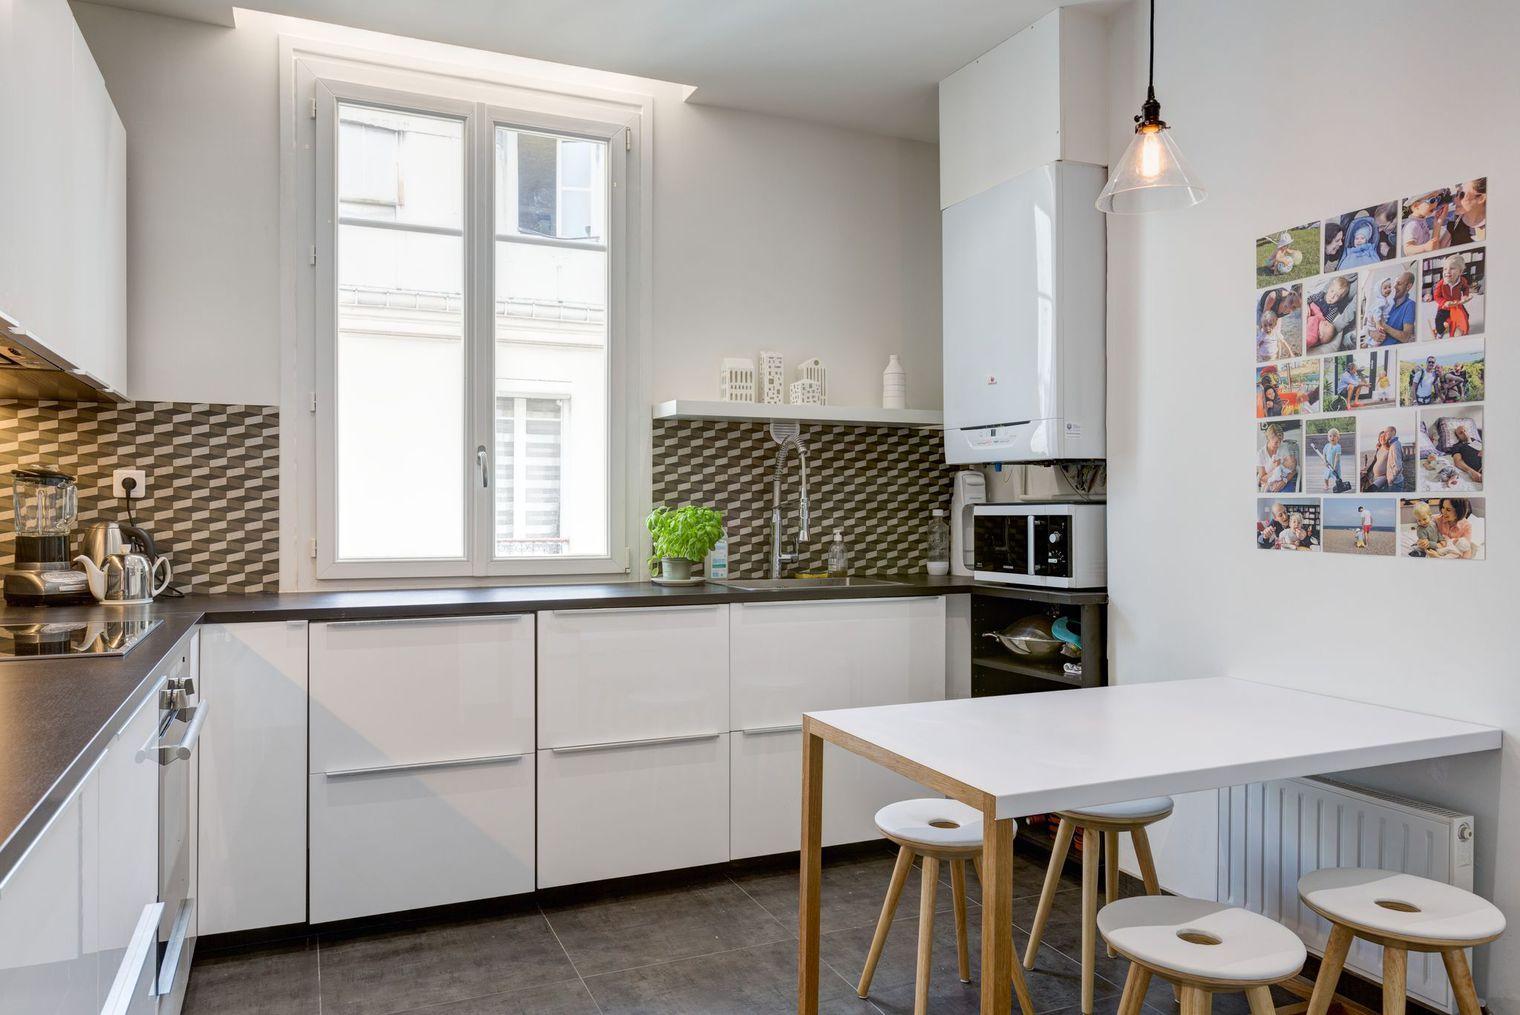 Se d cider acheter un appartement neuf montpellier for Acheter appartement neuf